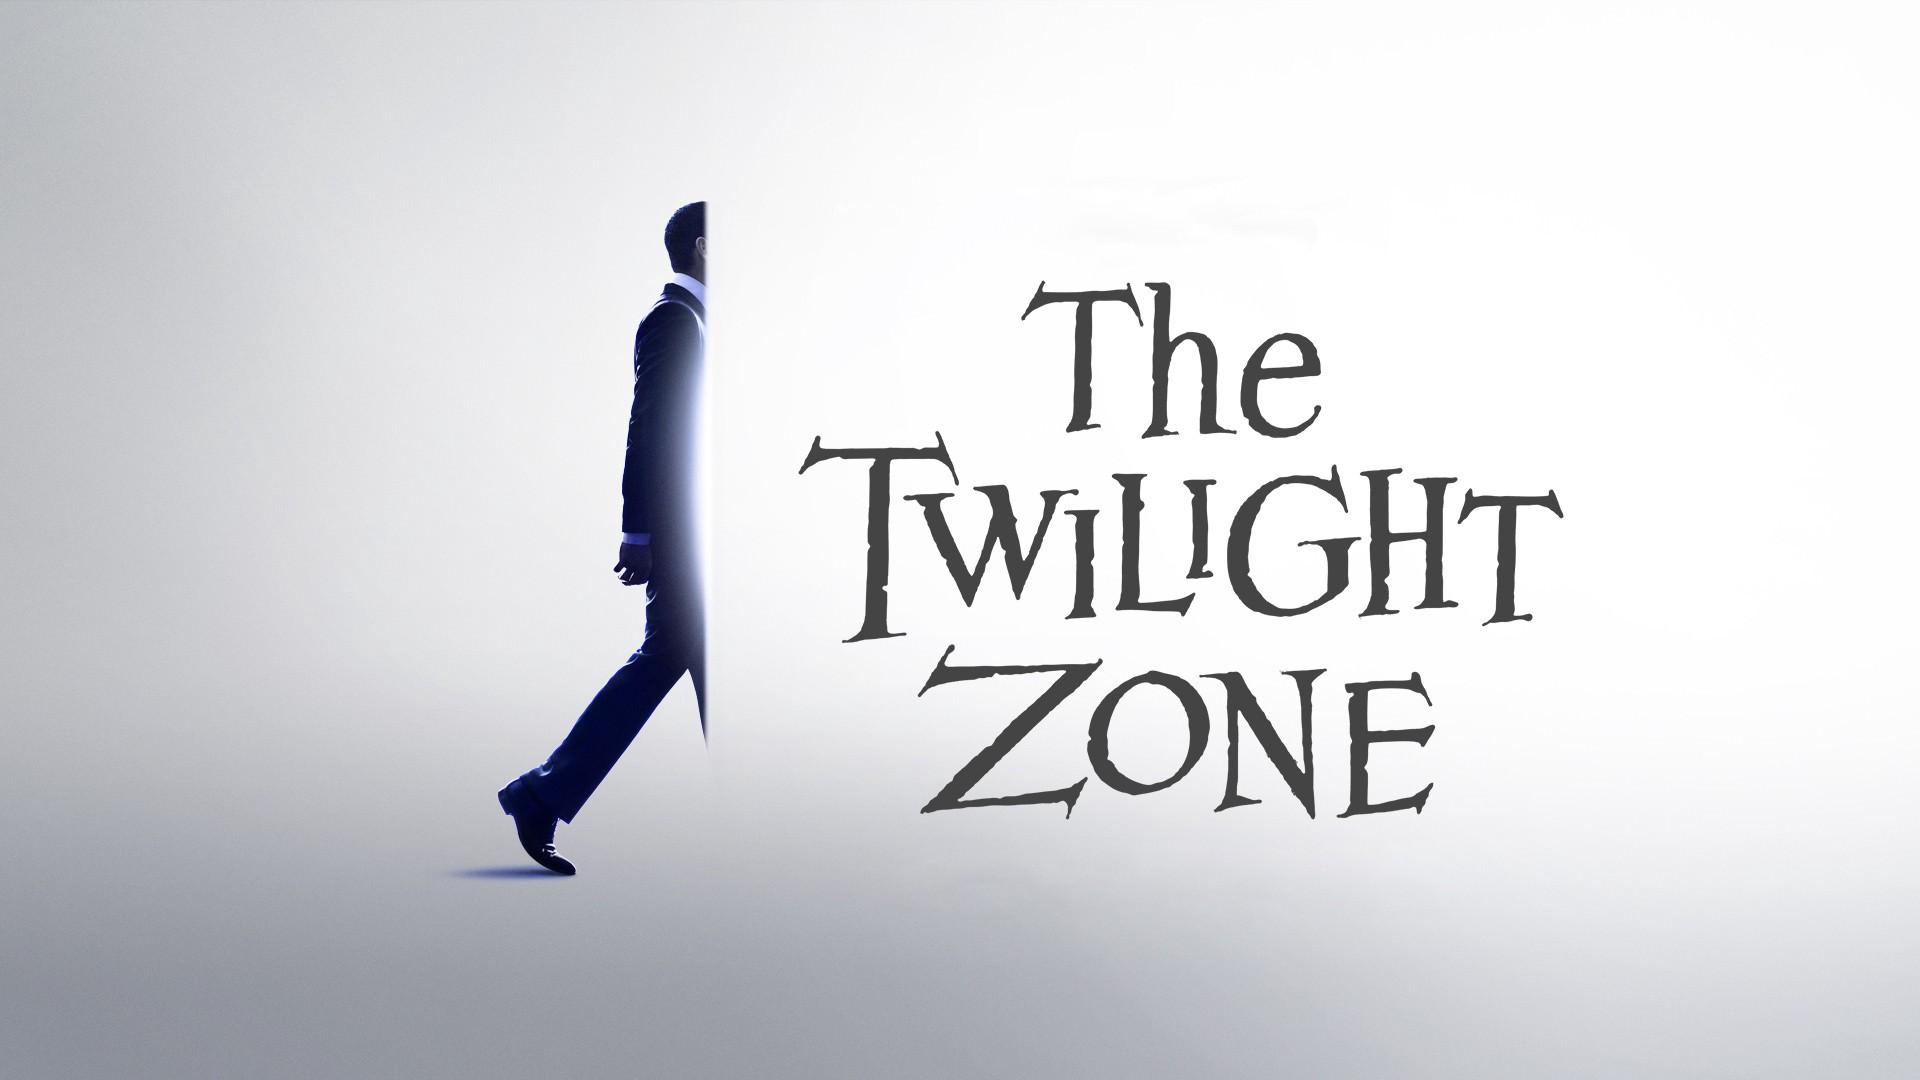 لوگوی سریال The Twilight Zone